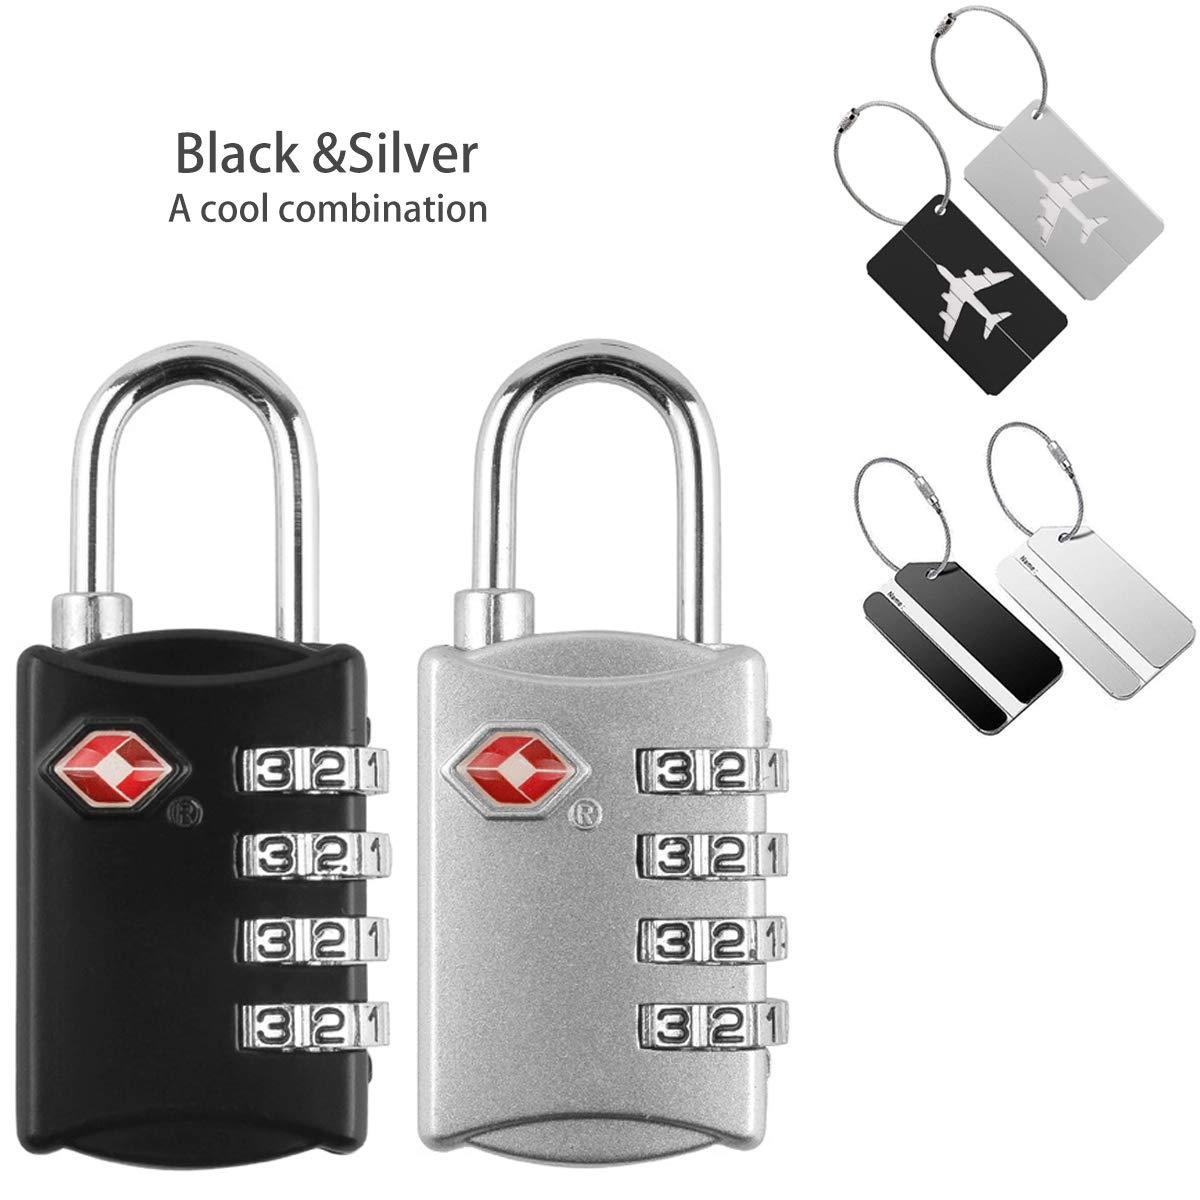 TSA luggage locks(2 packs) with Luggage Tags(4 packs), TSA Approved Travel Locks for Suitcases & Baggage